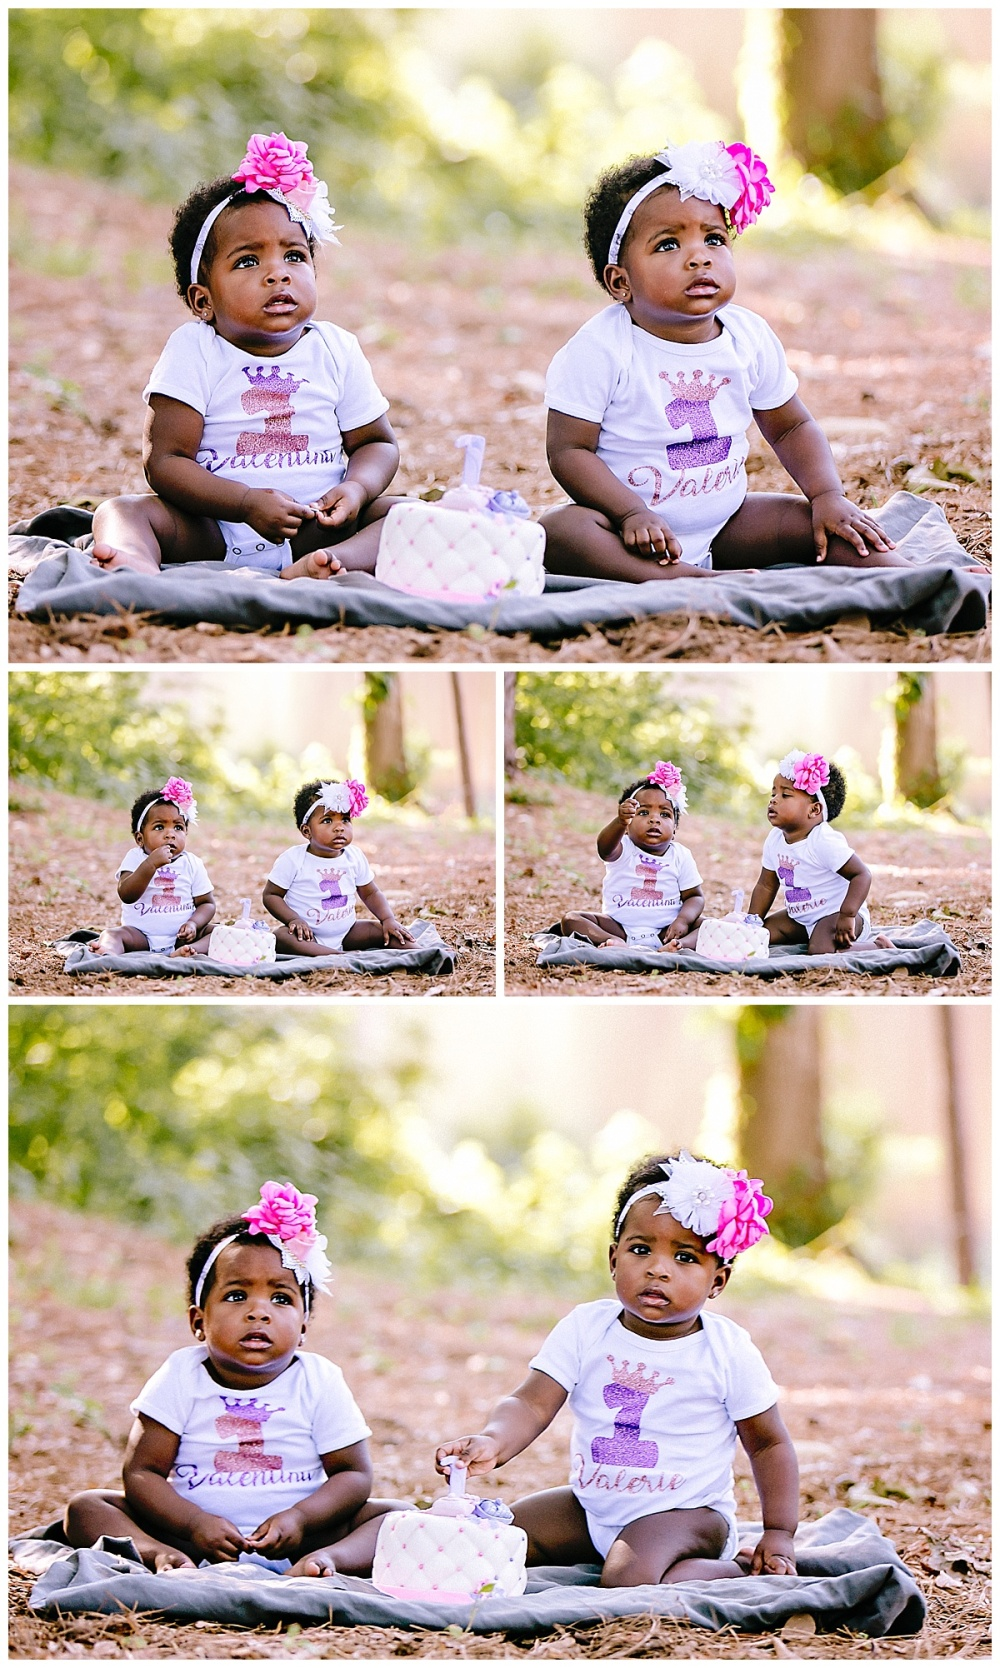 Carly-Barton-Photography-Family-Session-Kilgore-Texas-Twins-1-year-birthday-cake-smash-Olowo-family-photos_0024.jpg